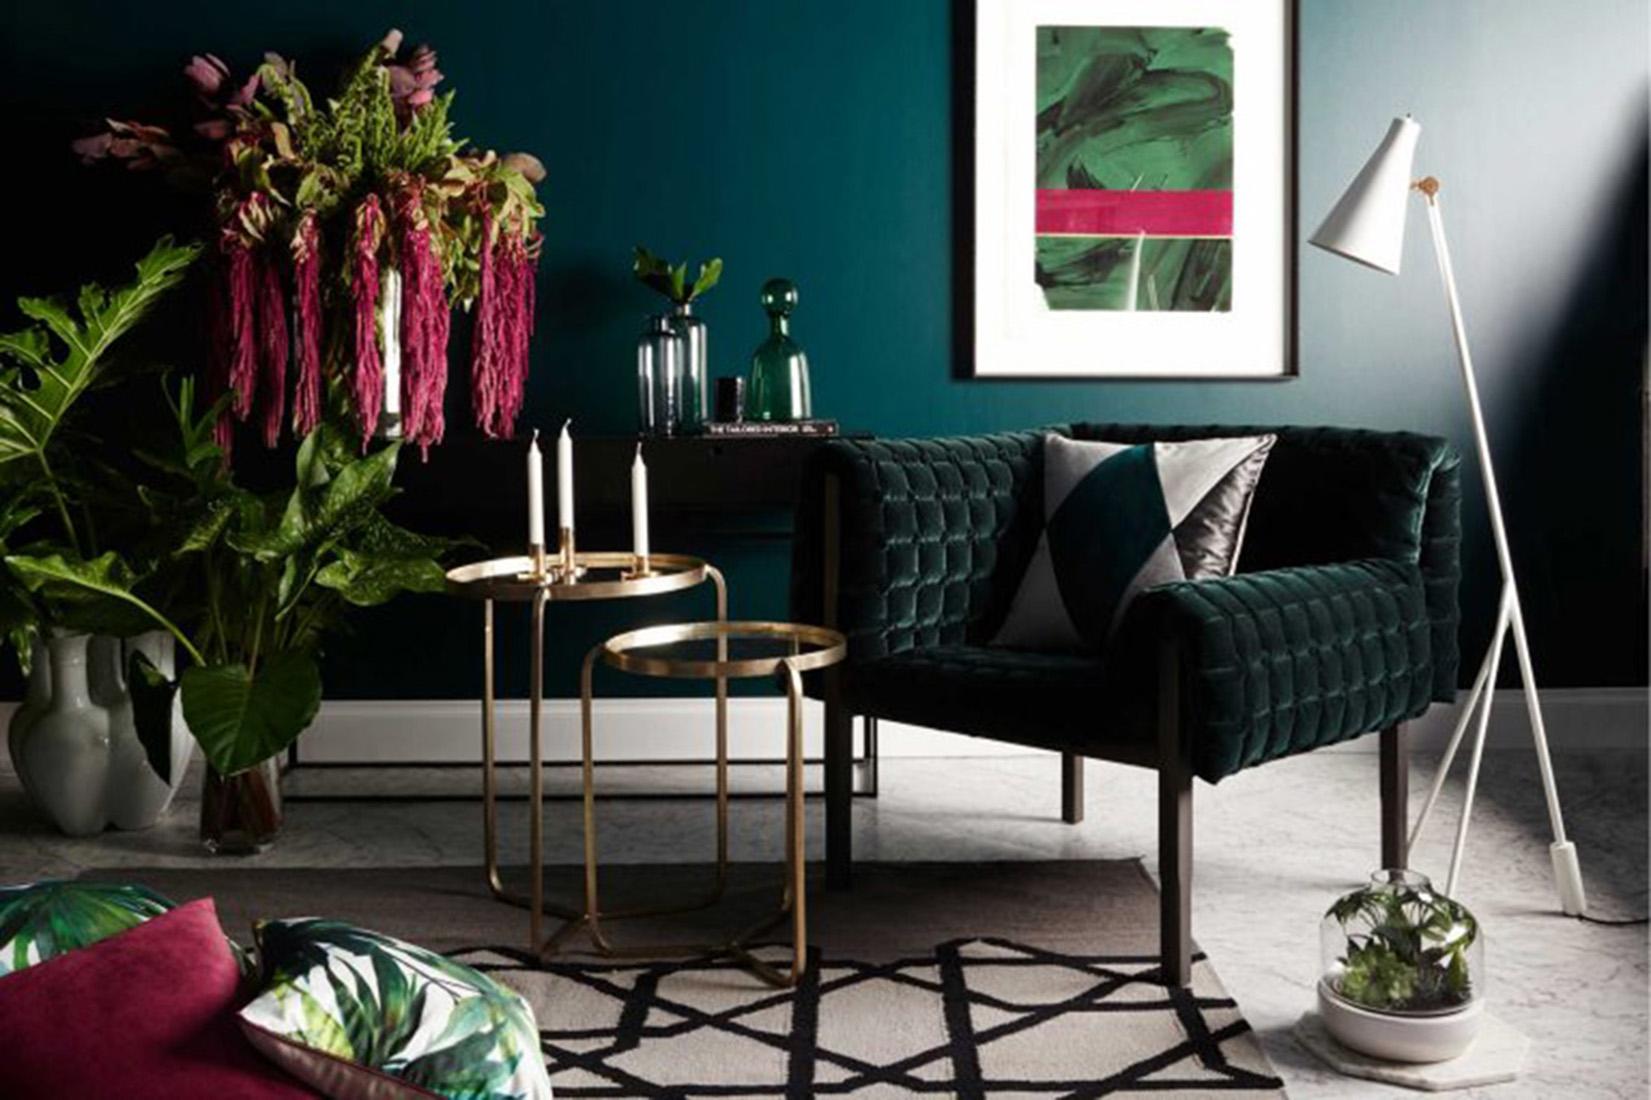 Vibrant, Patterned Plants